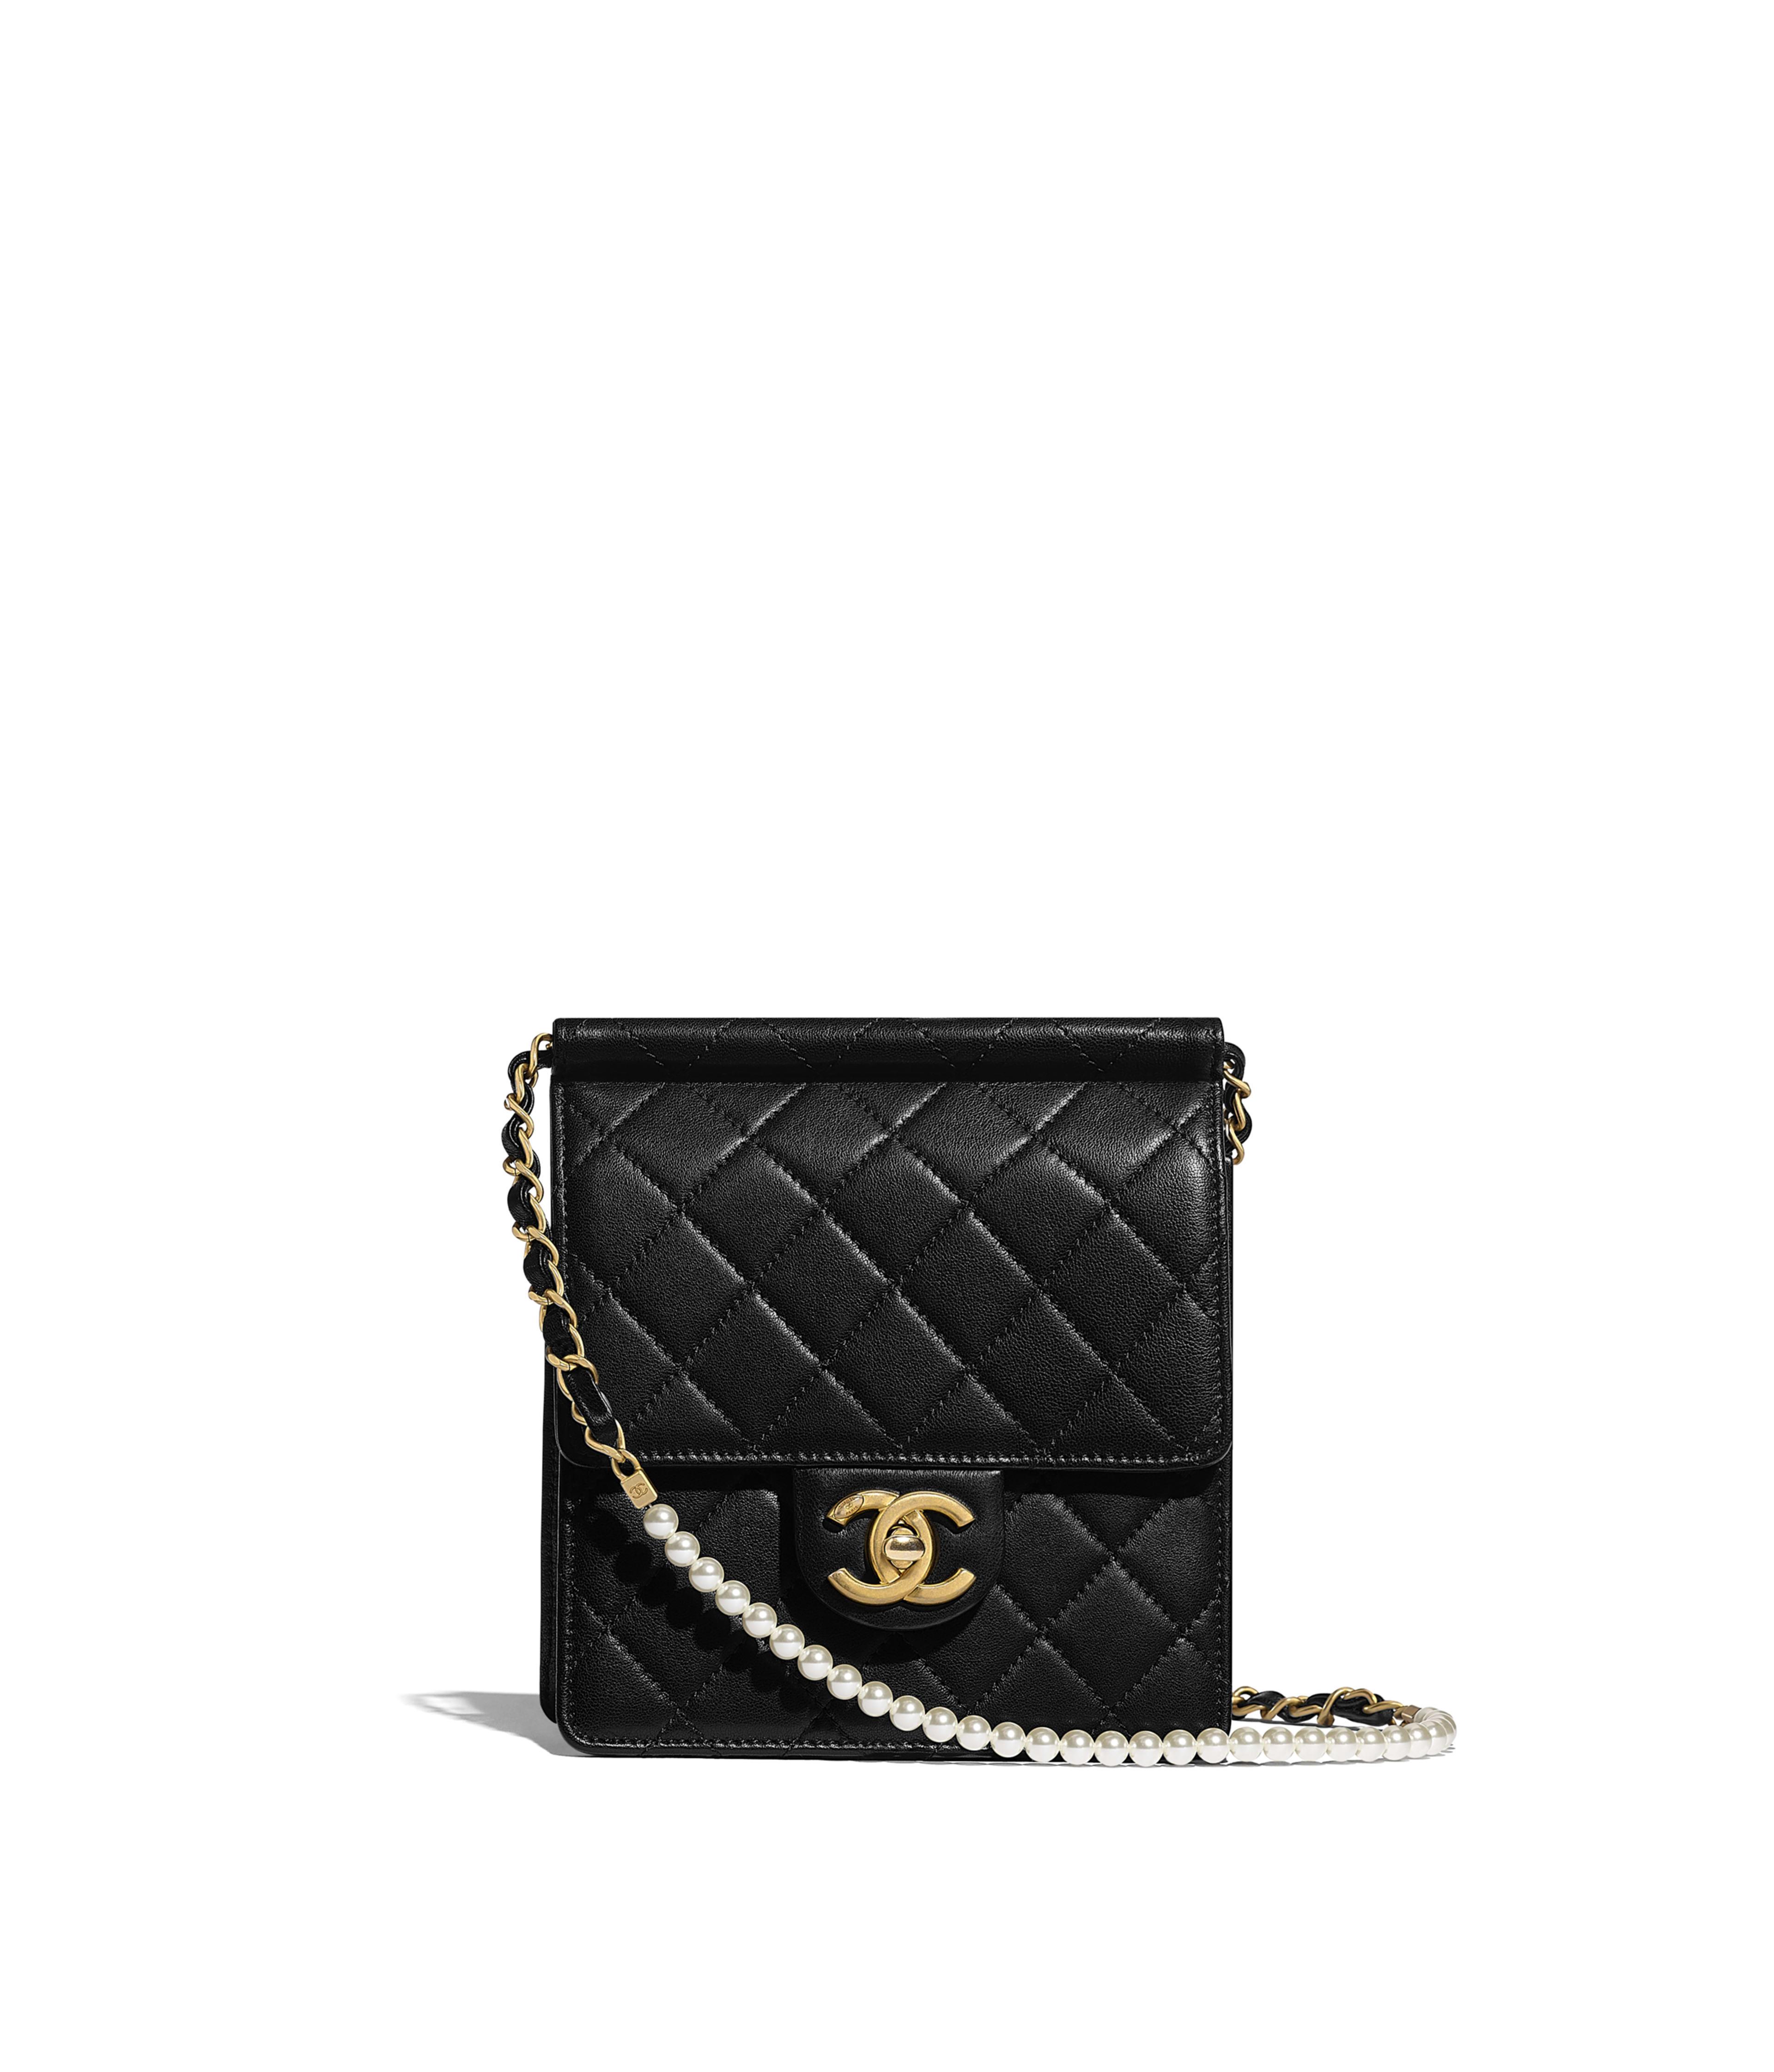 0c3693431a76 Flap Bag Lambskin, Imitation Pearls & Gold-Tone Metal, Black Ref.  AS0580B0037194305